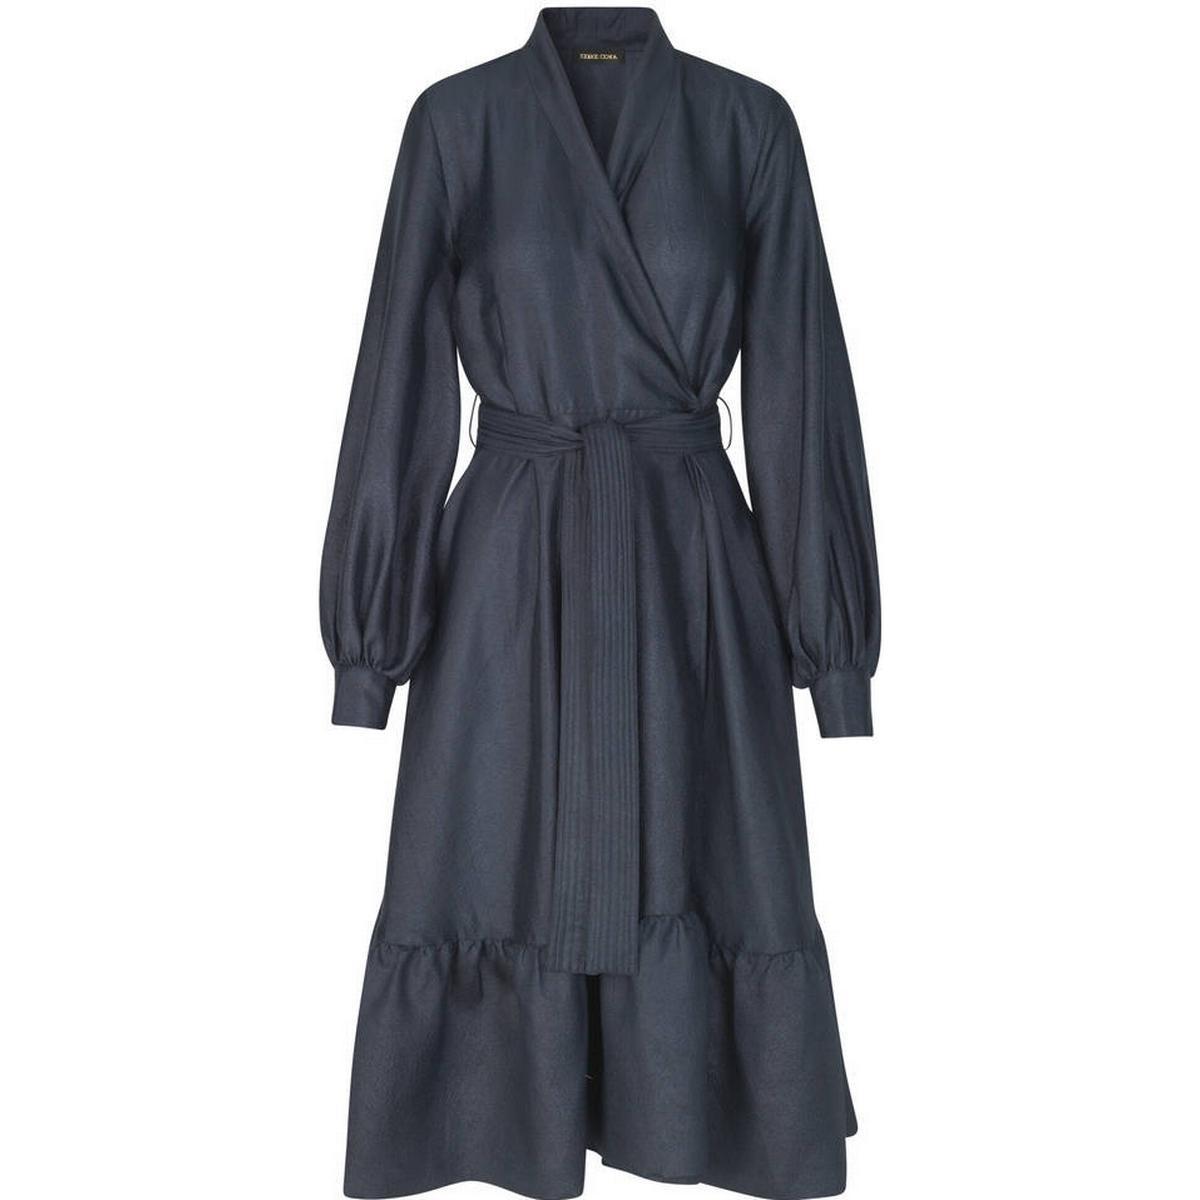 a41c952b8a38 Stine Goya Klänningar Damkläder - Jämför priser på dress PriceRunner